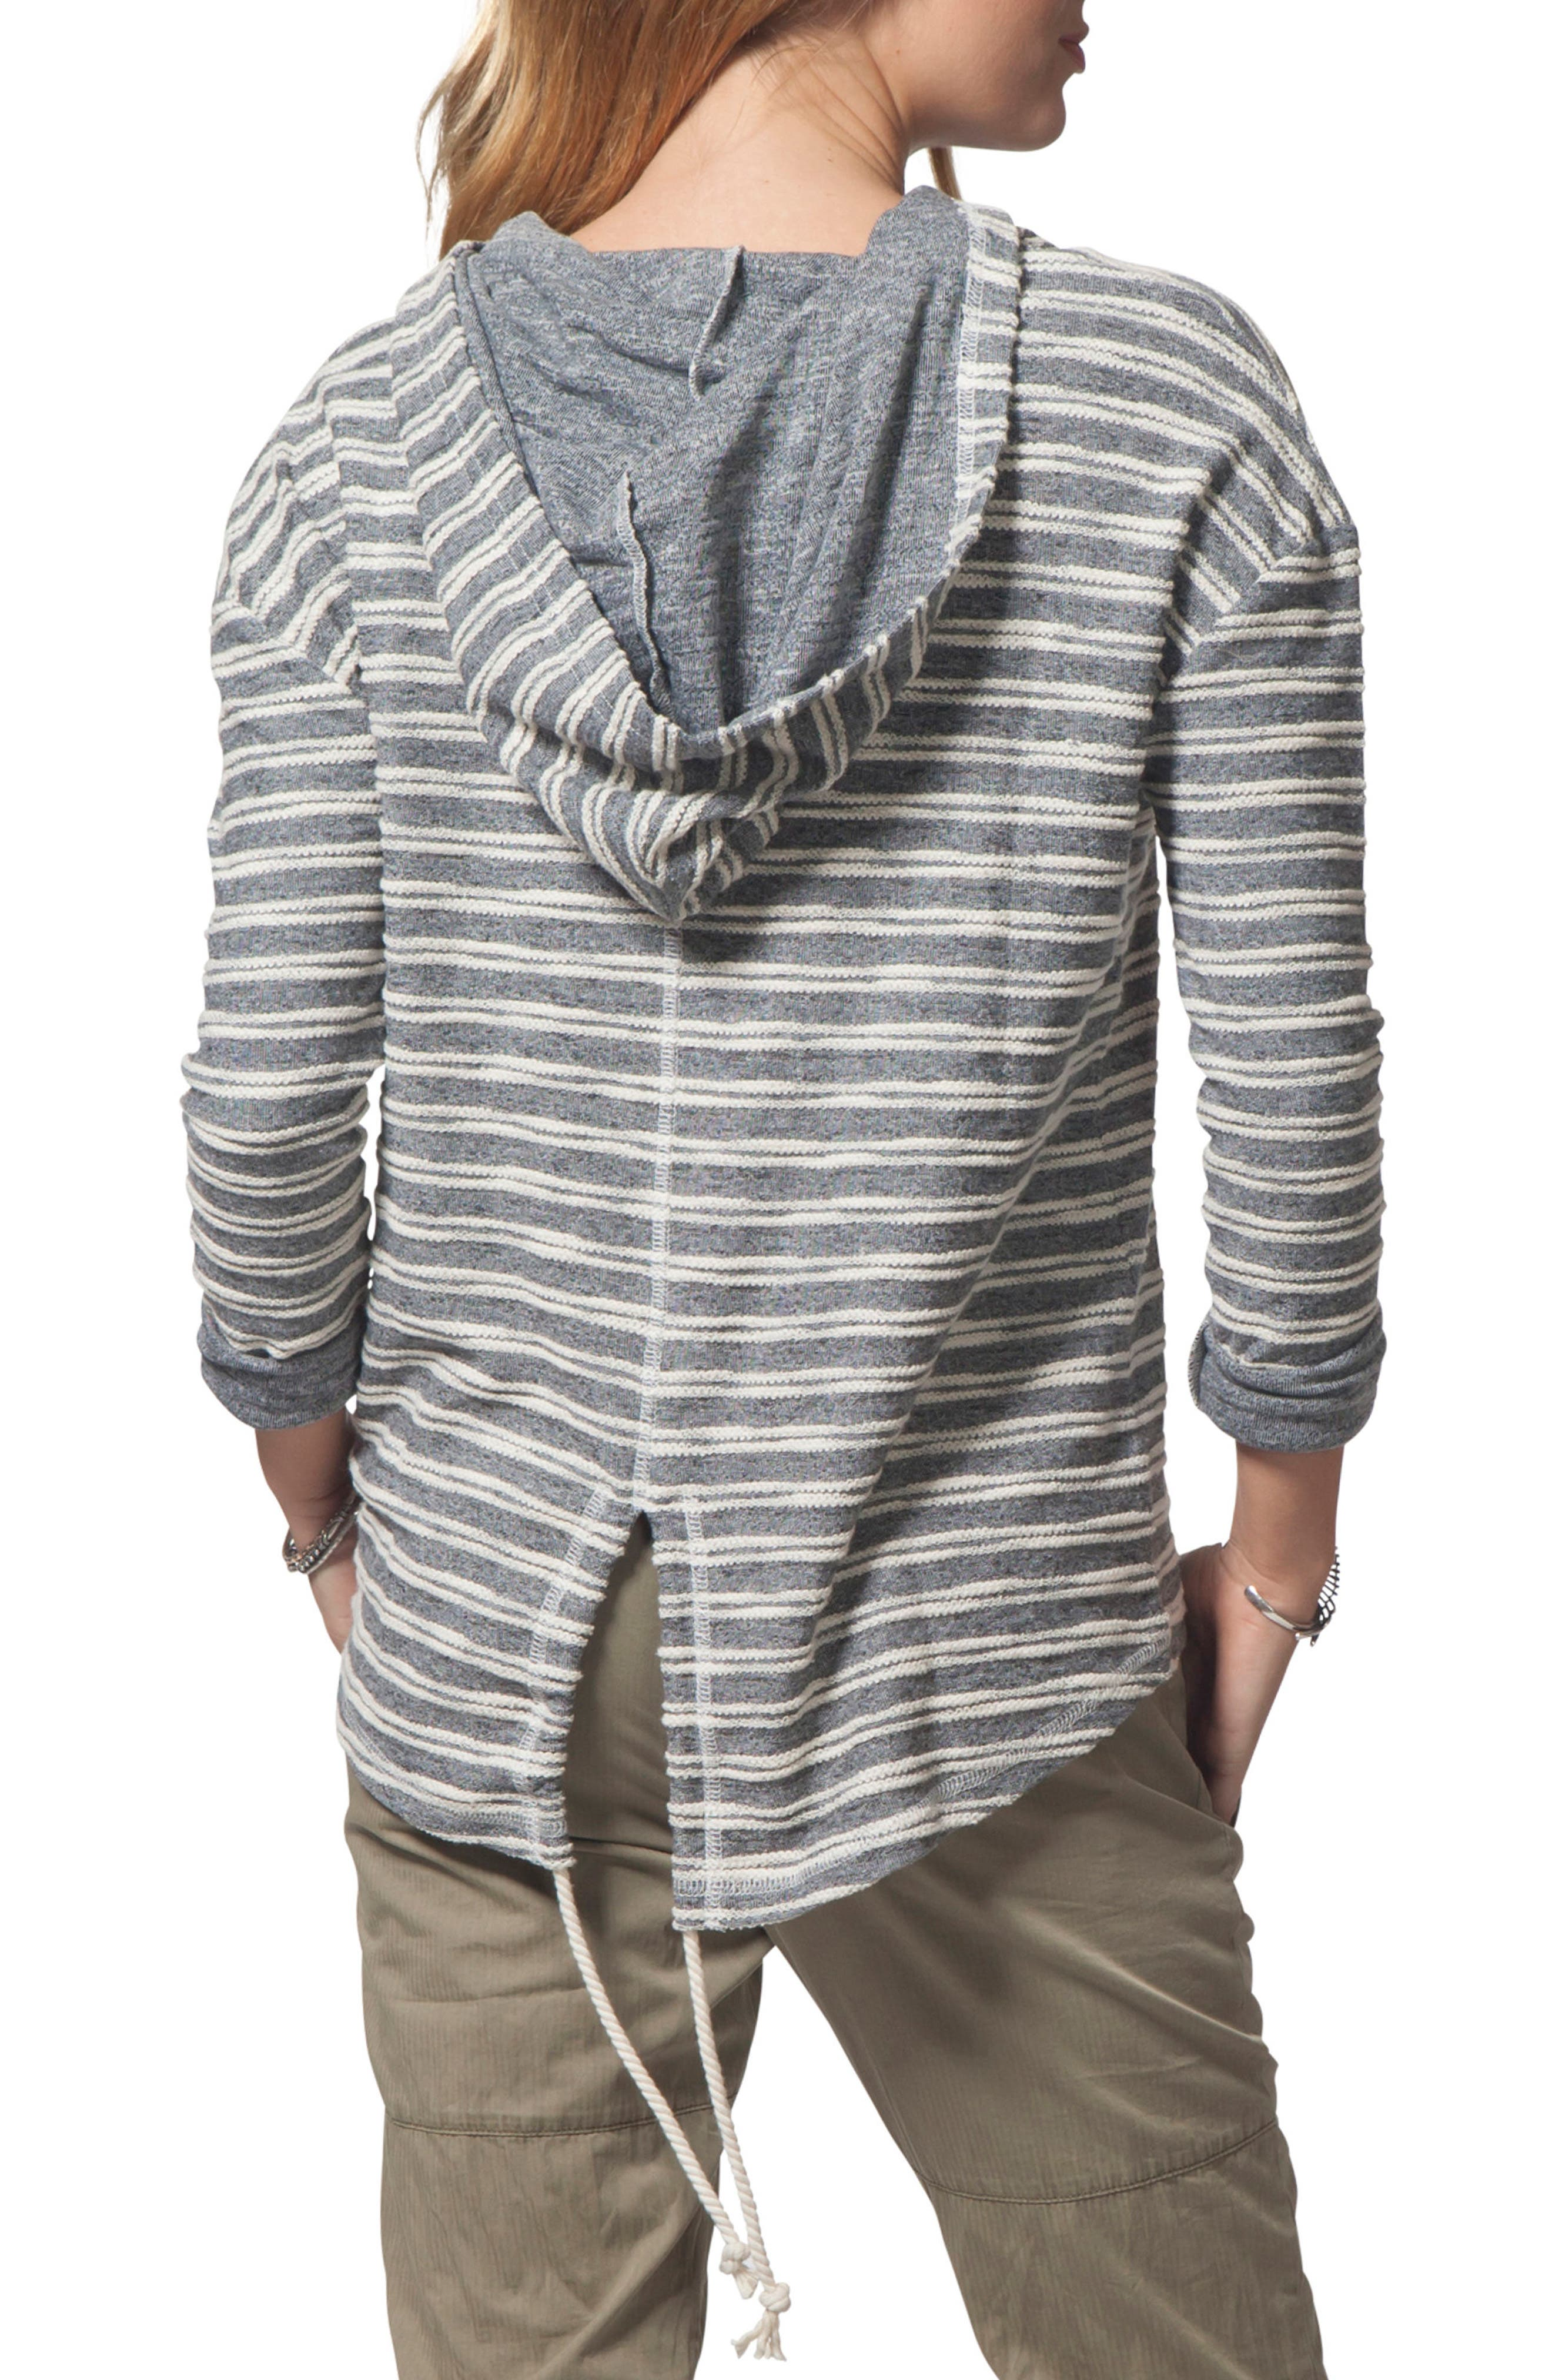 Next Move Stripe Hooded Pullover,                             Alternate thumbnail 2, color,                             BLACK